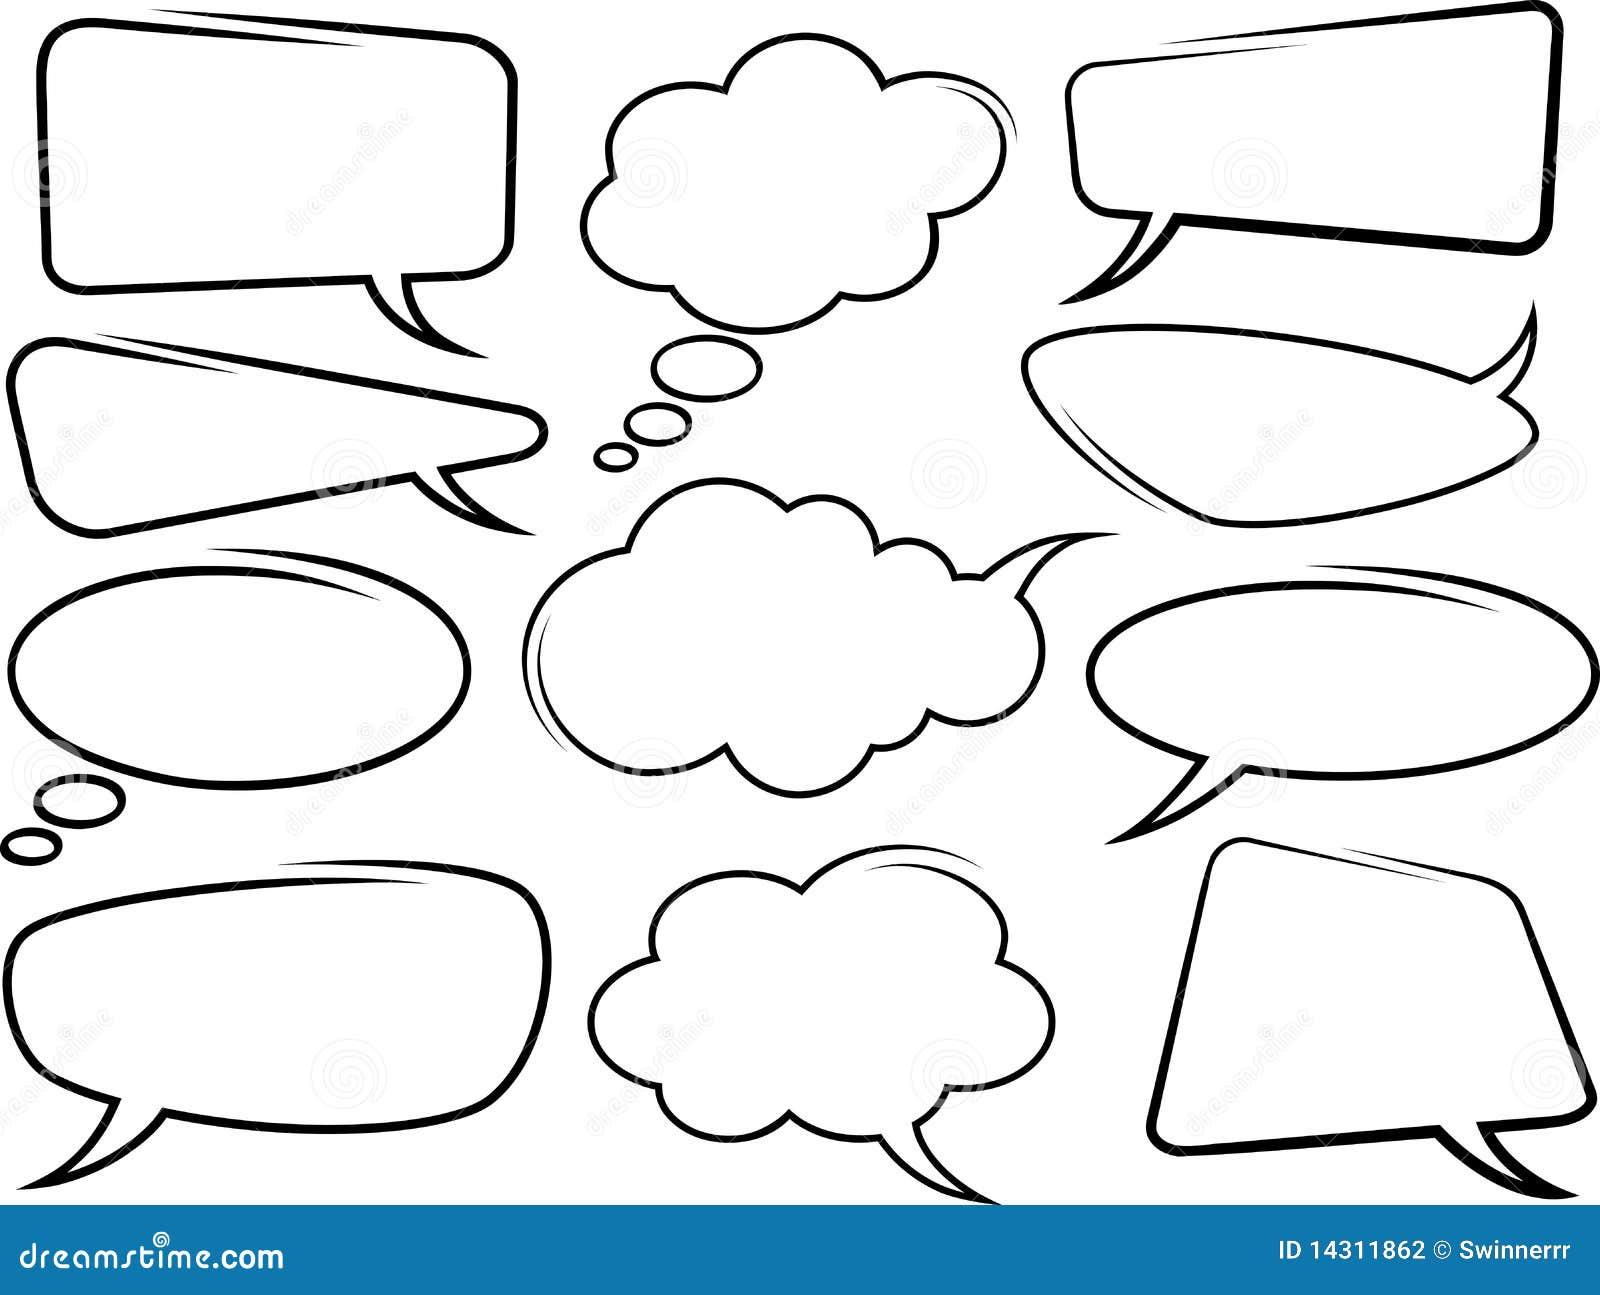 Speech Bubbles. Vector Stock Vector. Illustration Of Label